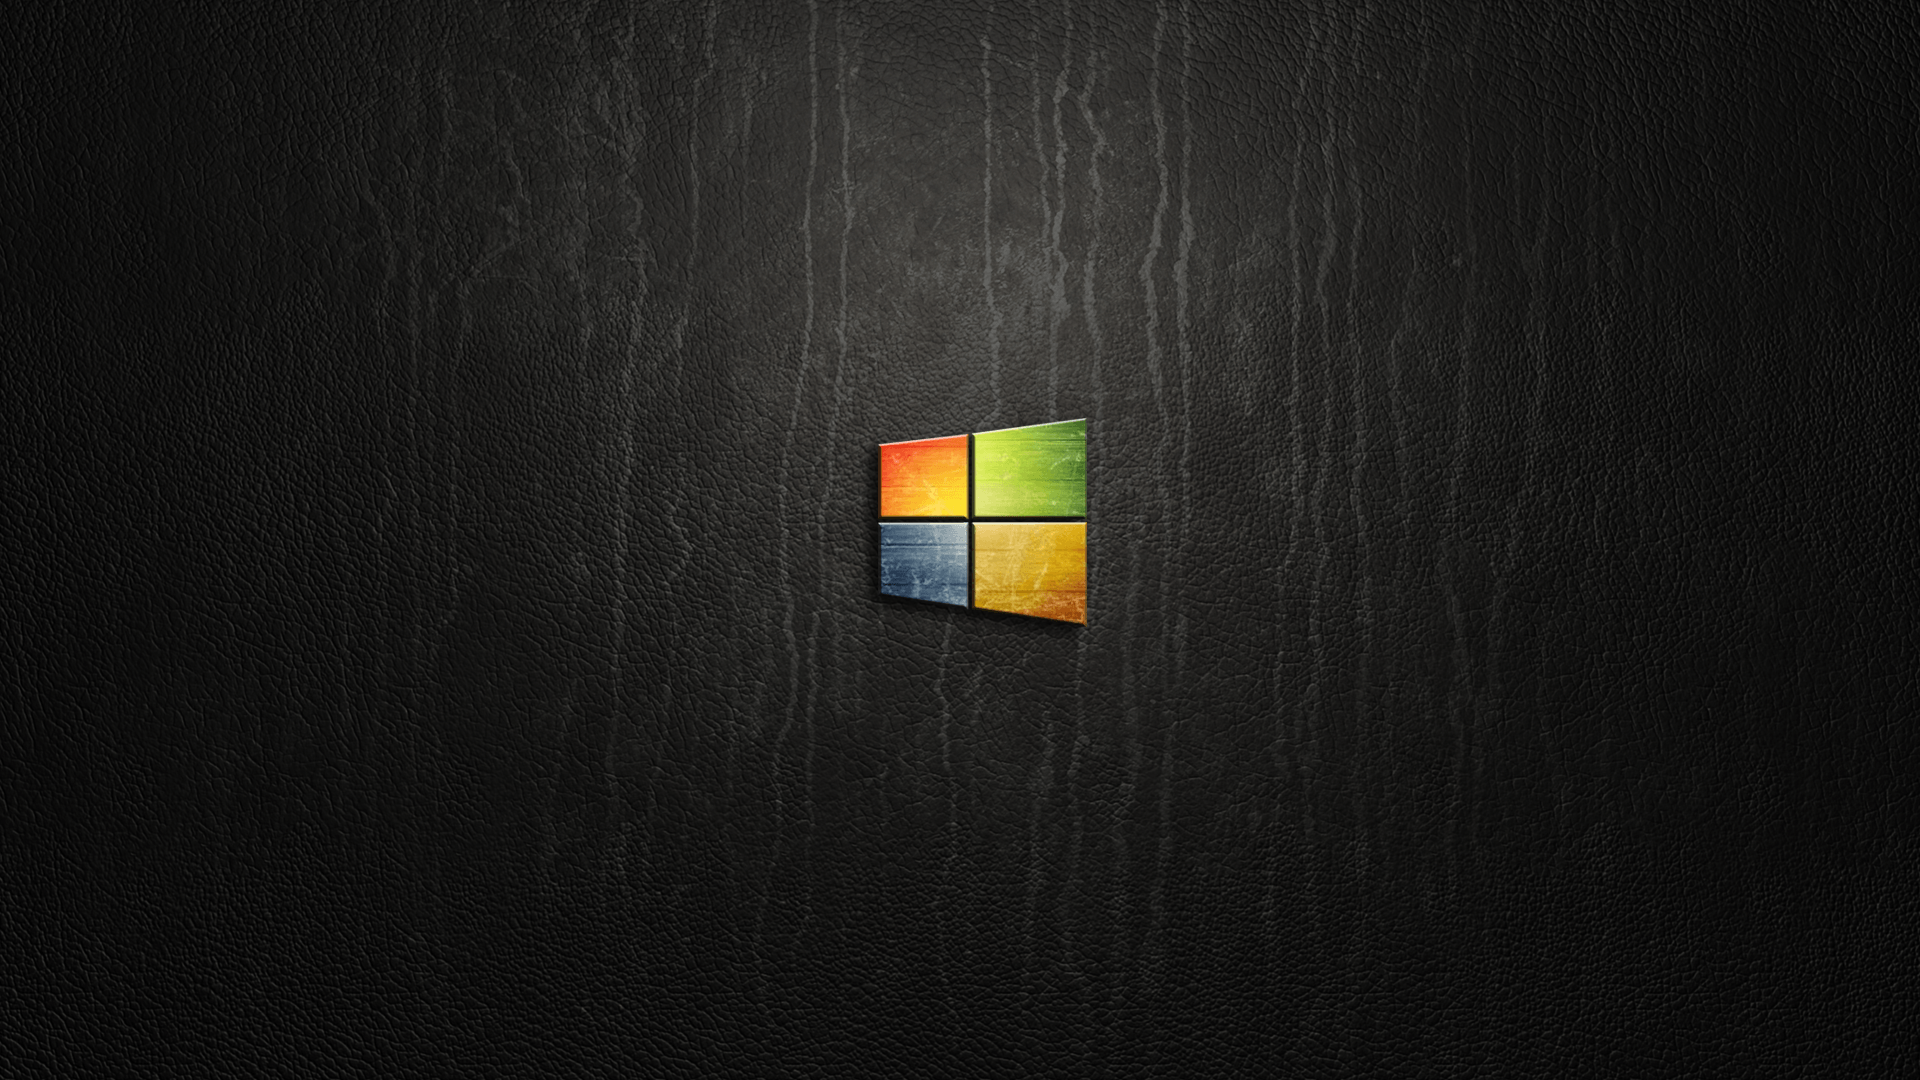 Windows Hd Wallpapers On Wallpaperdog